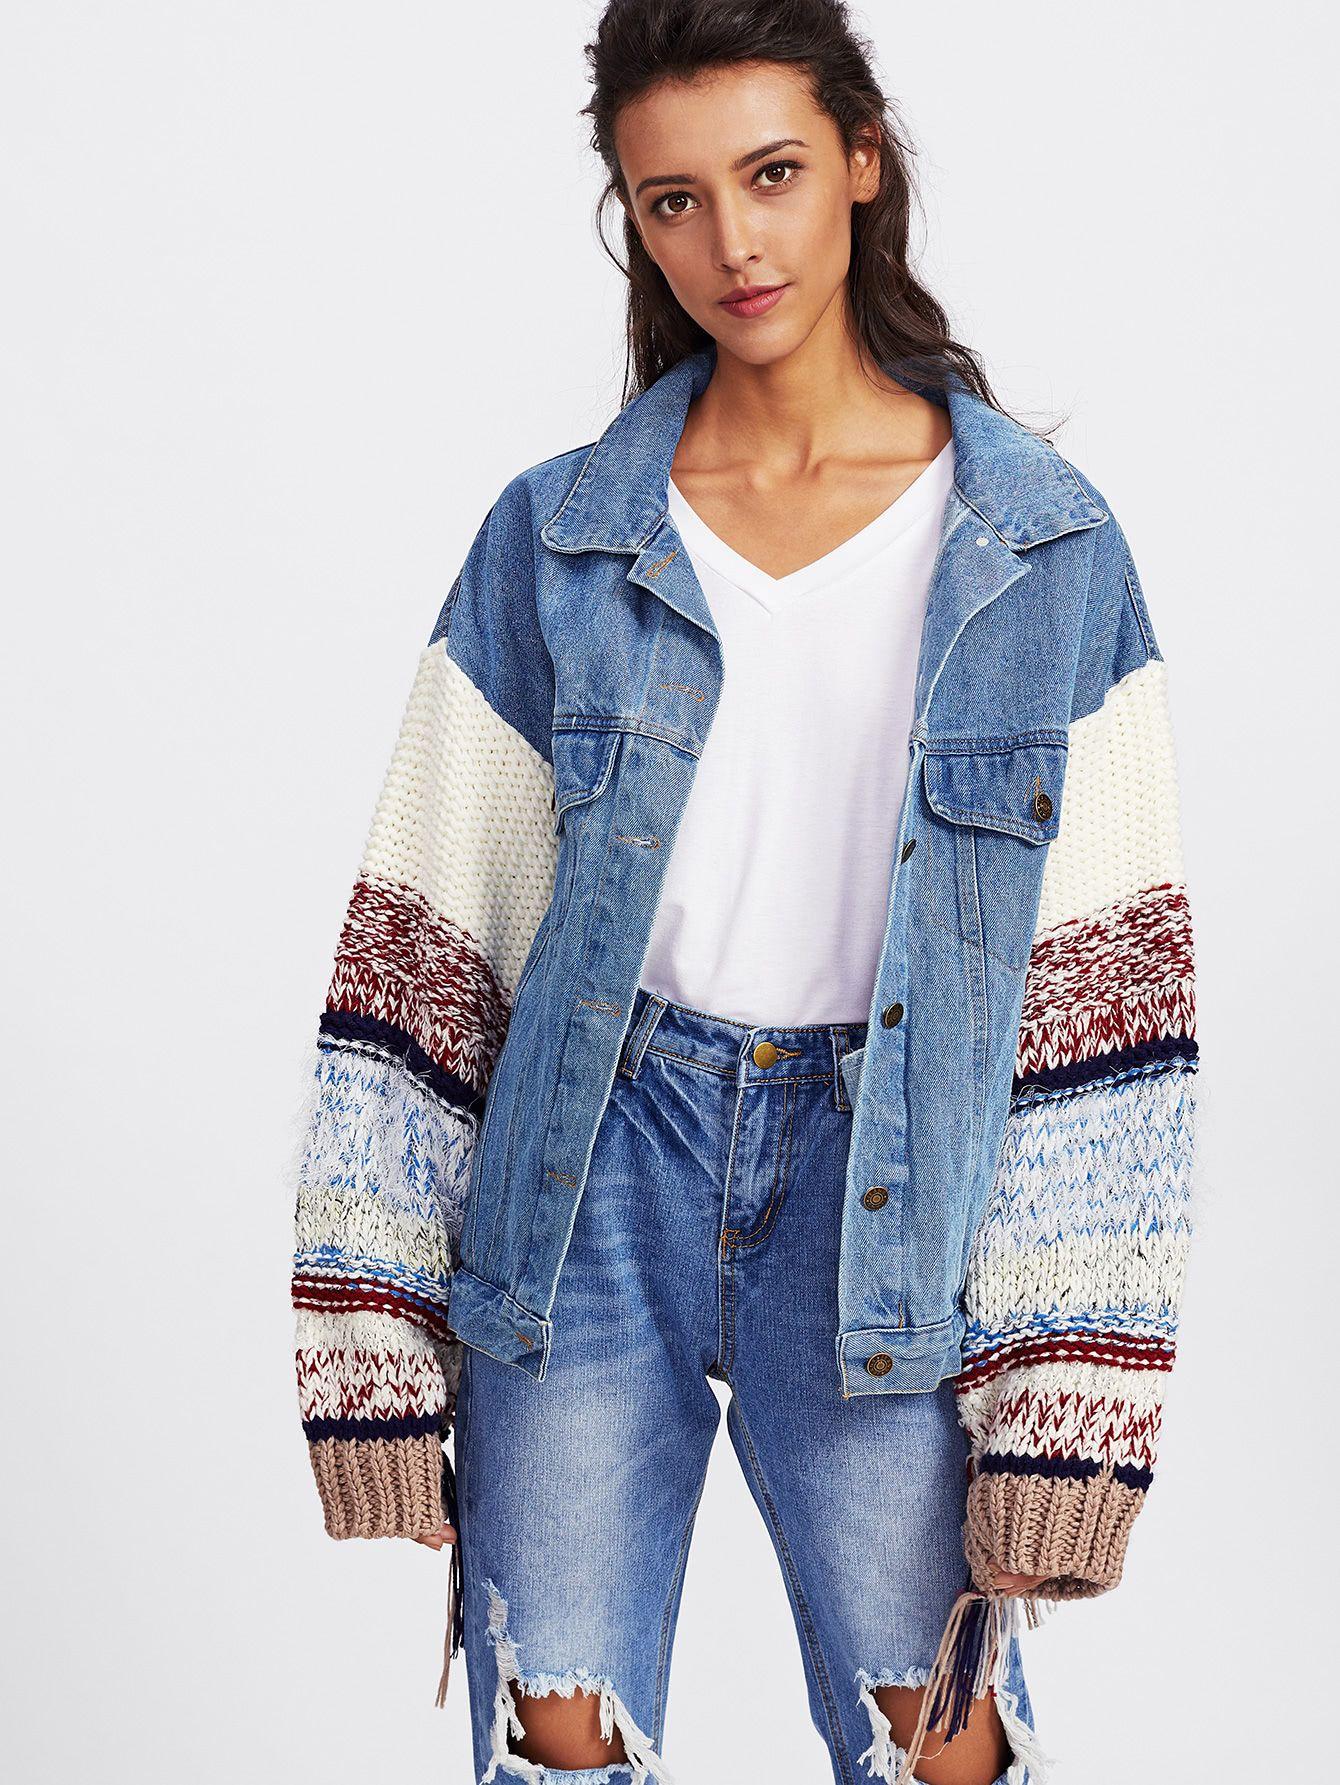 Shop Contrast Knit Sleeve Denim Jacket Online Shein Offers Contrast Knit Sleeve Denim Jacket Amp More To Fit You Denim Jacket Women Denim Jacket Denim Ideas [ 1785 x 1340 Pixel ]